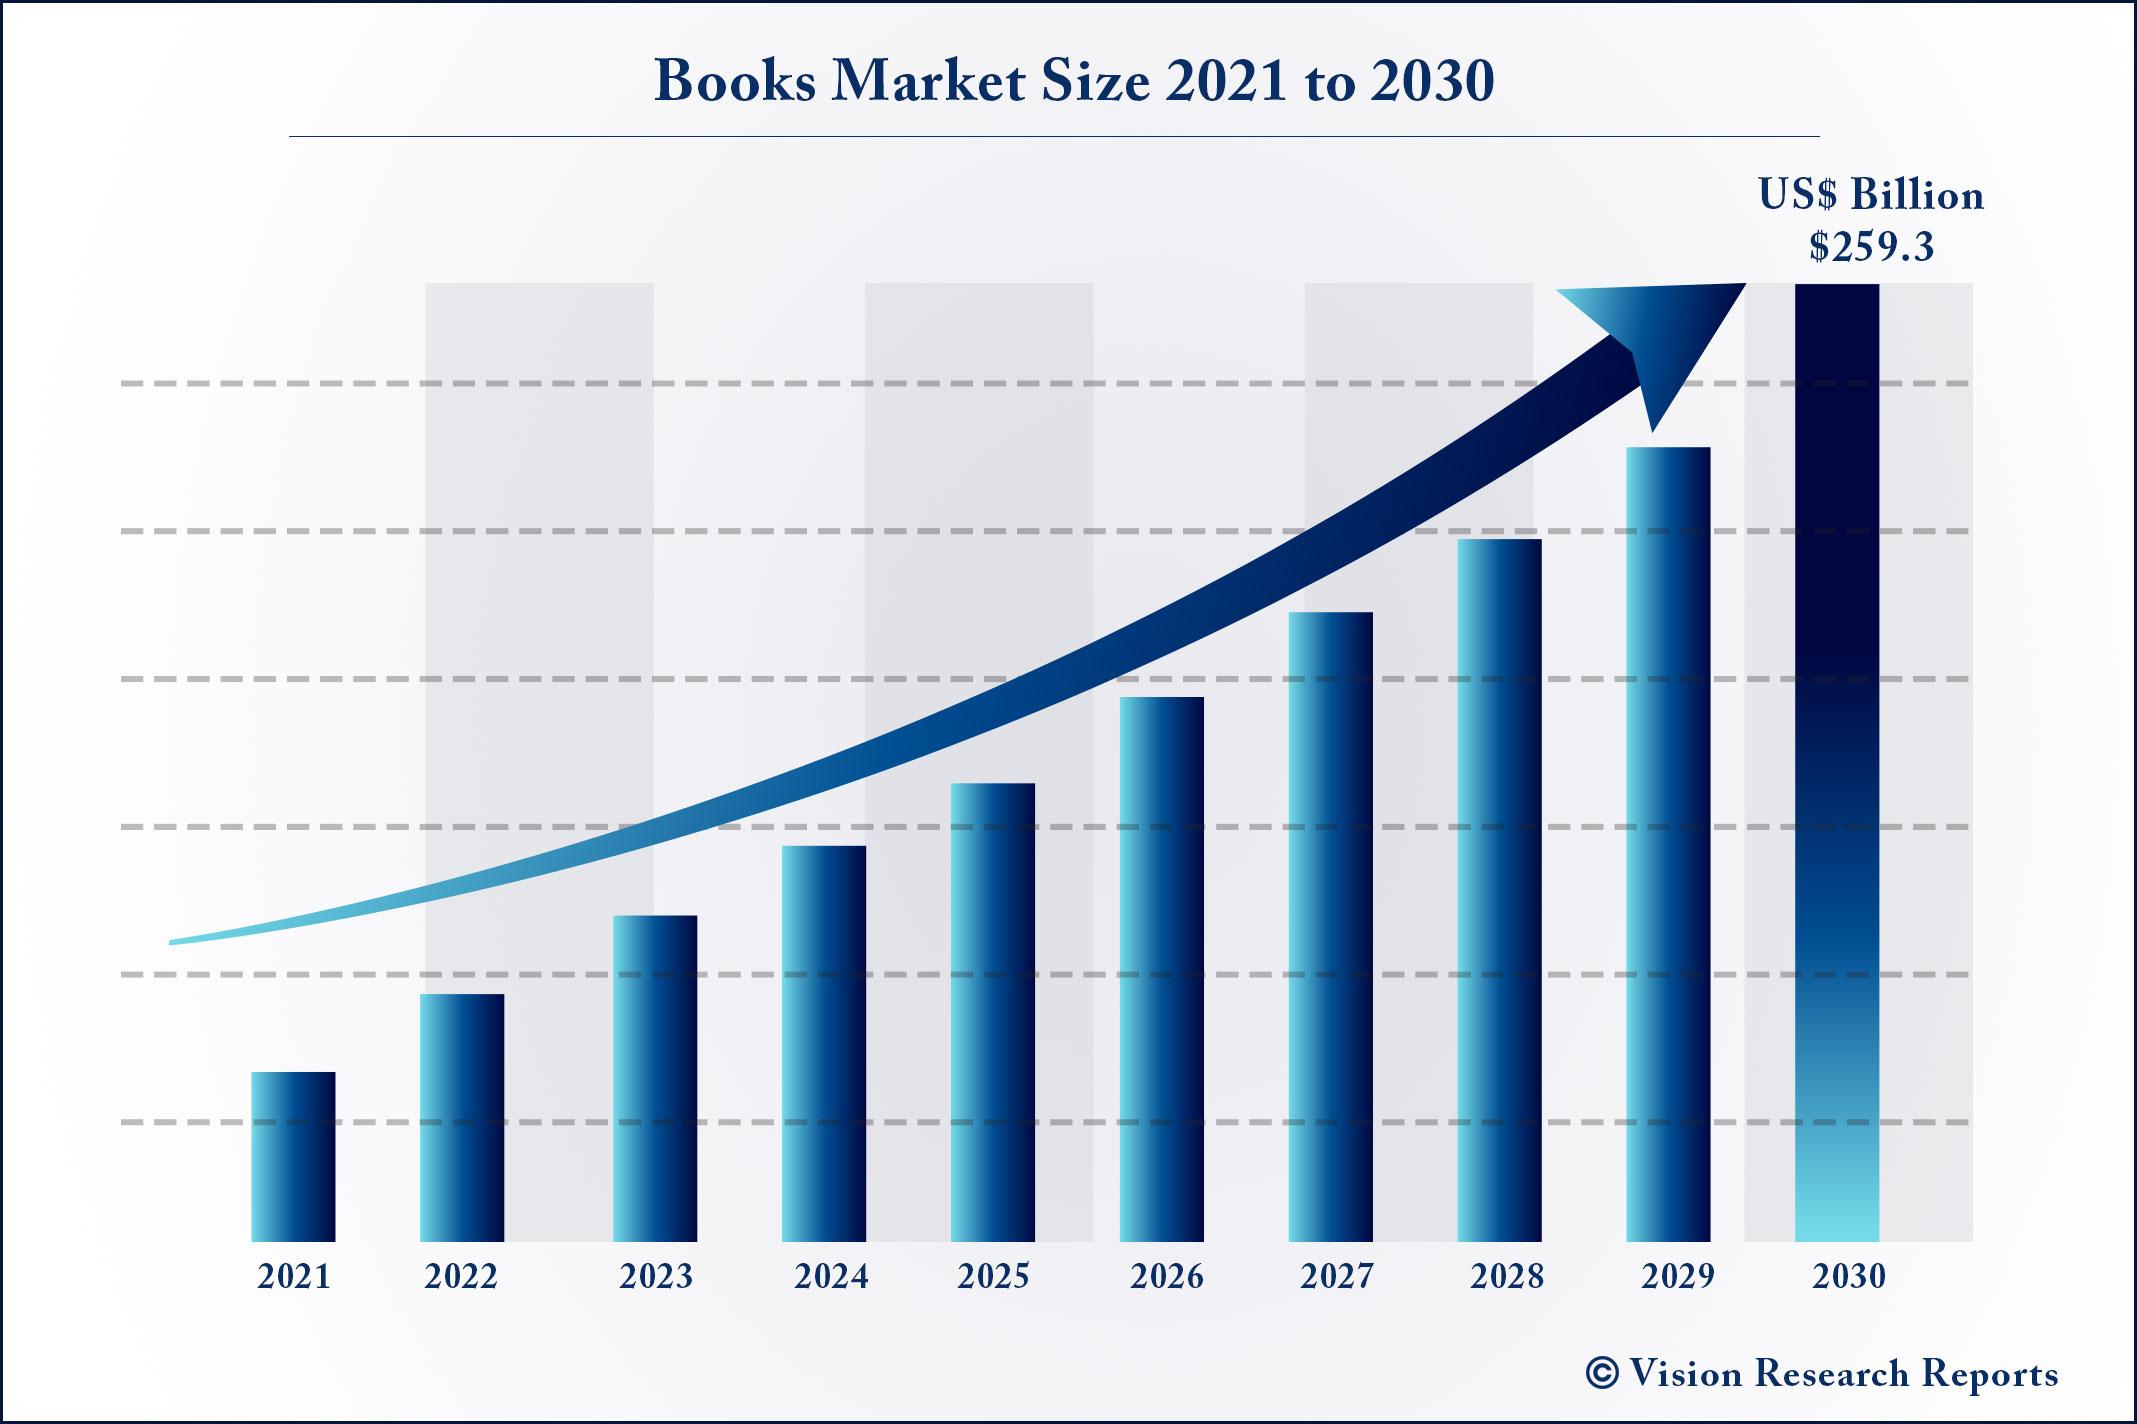 Books Market Size 2021 to 2030